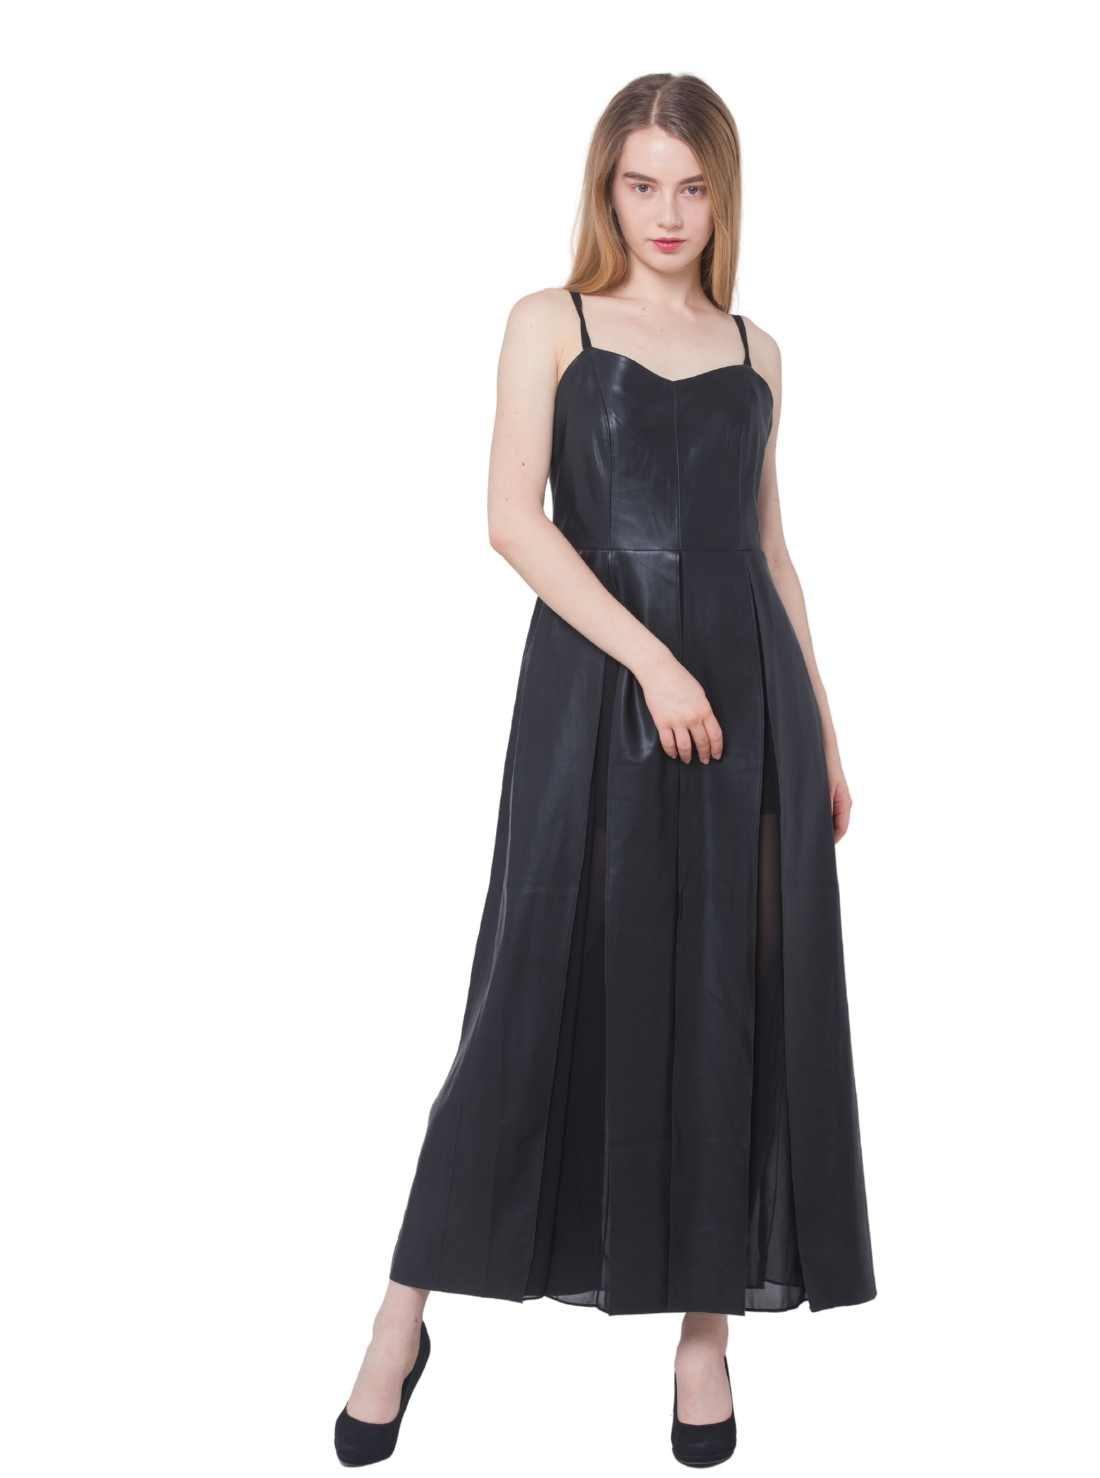 Slip A-Line PU Mix Chiffon Maxi Dress